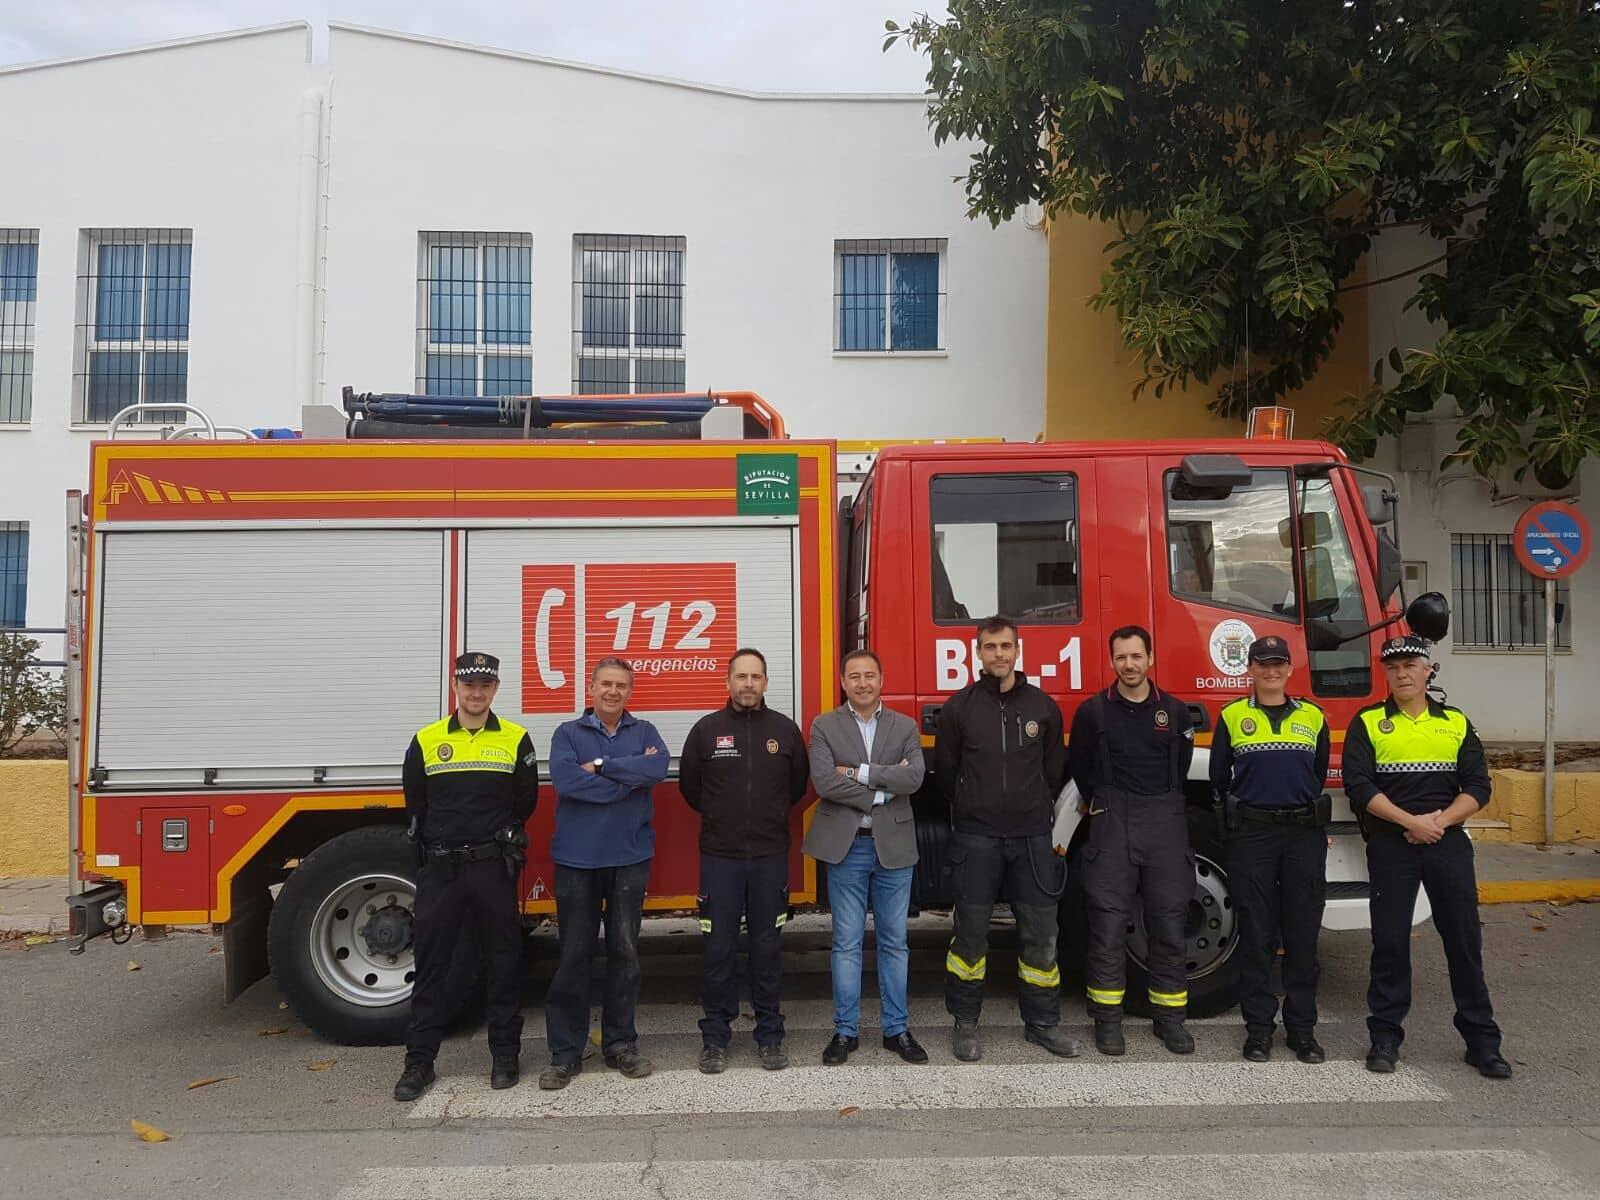 mairena-ya-tiene-reten-de-bomberos-1